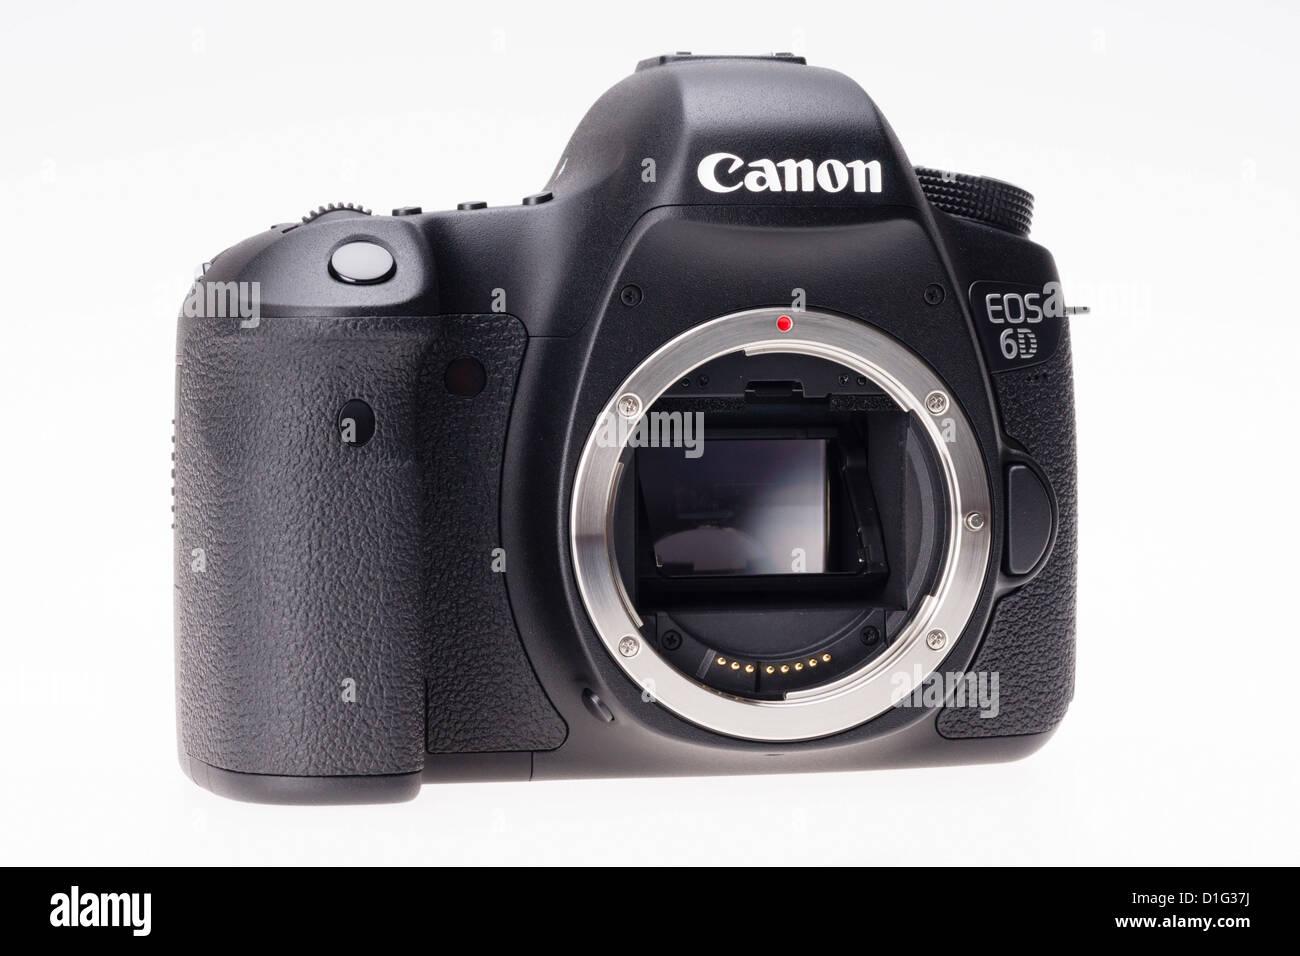 Fotoausrüstung - Canon EOS 6D full Frame DSLR, günstigen Preis ...